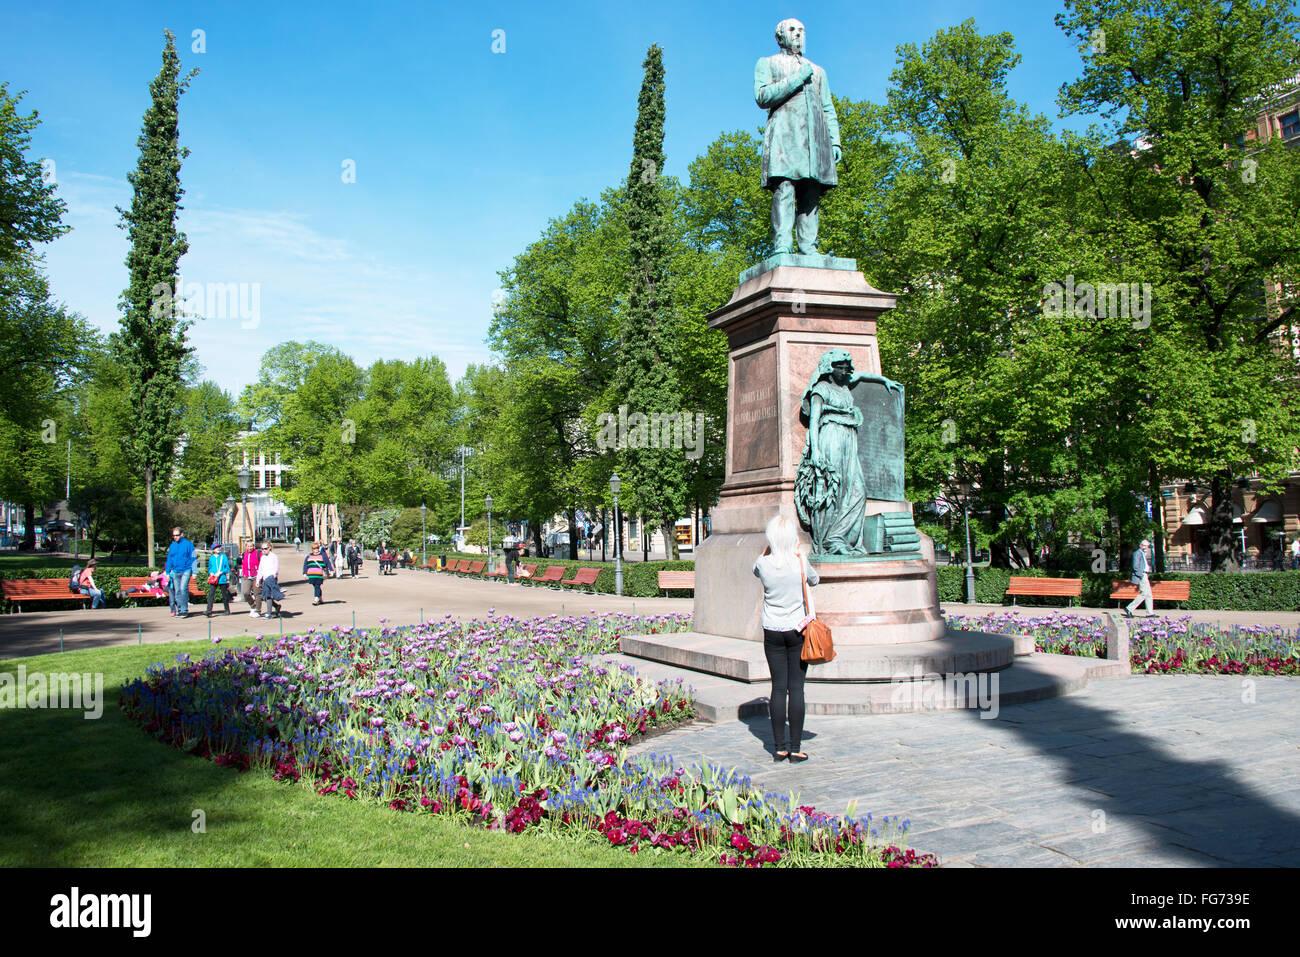 Esplanade Park, Helsinki, Uusimaa Region, Republic of Finland - Stock Image